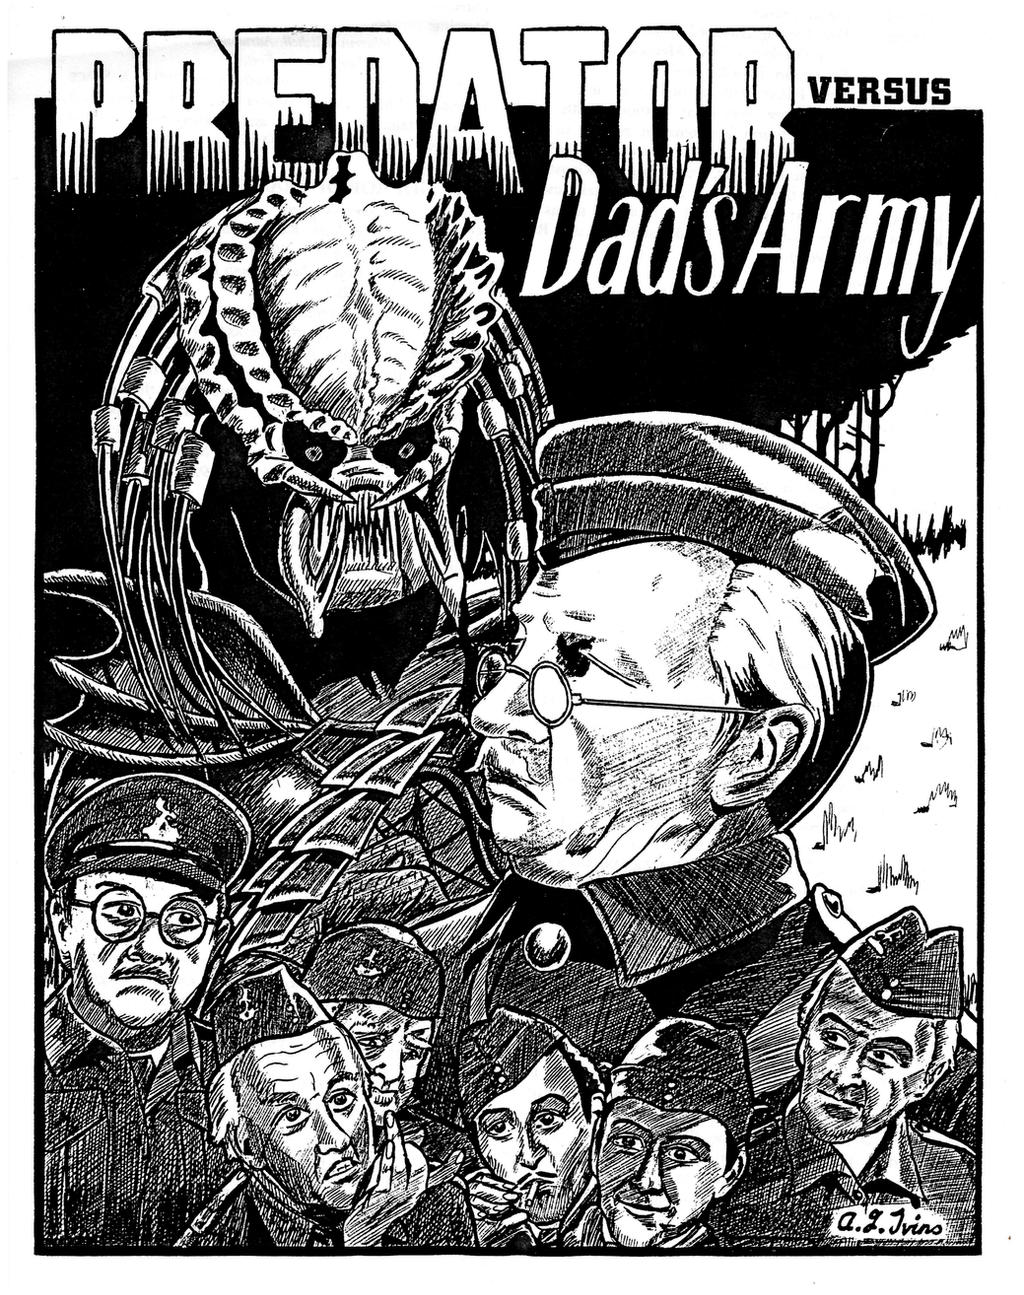 Predator Versus Dad's Army by studentofthevoid